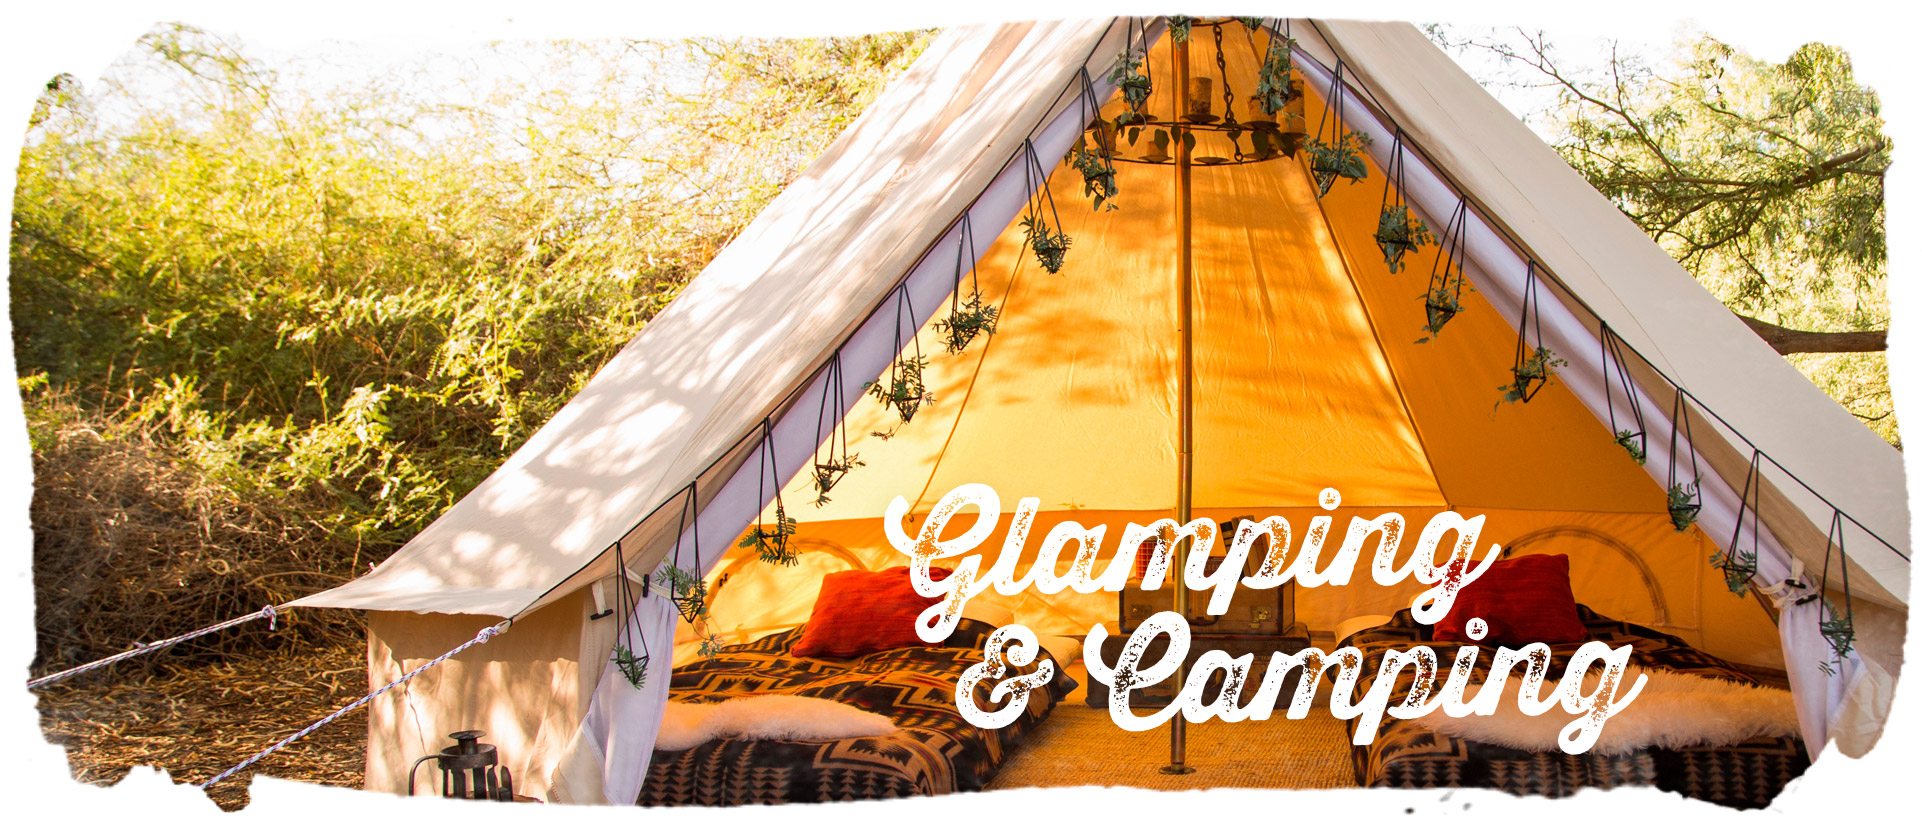 Glamping-Camping_Slider_Long.jpg